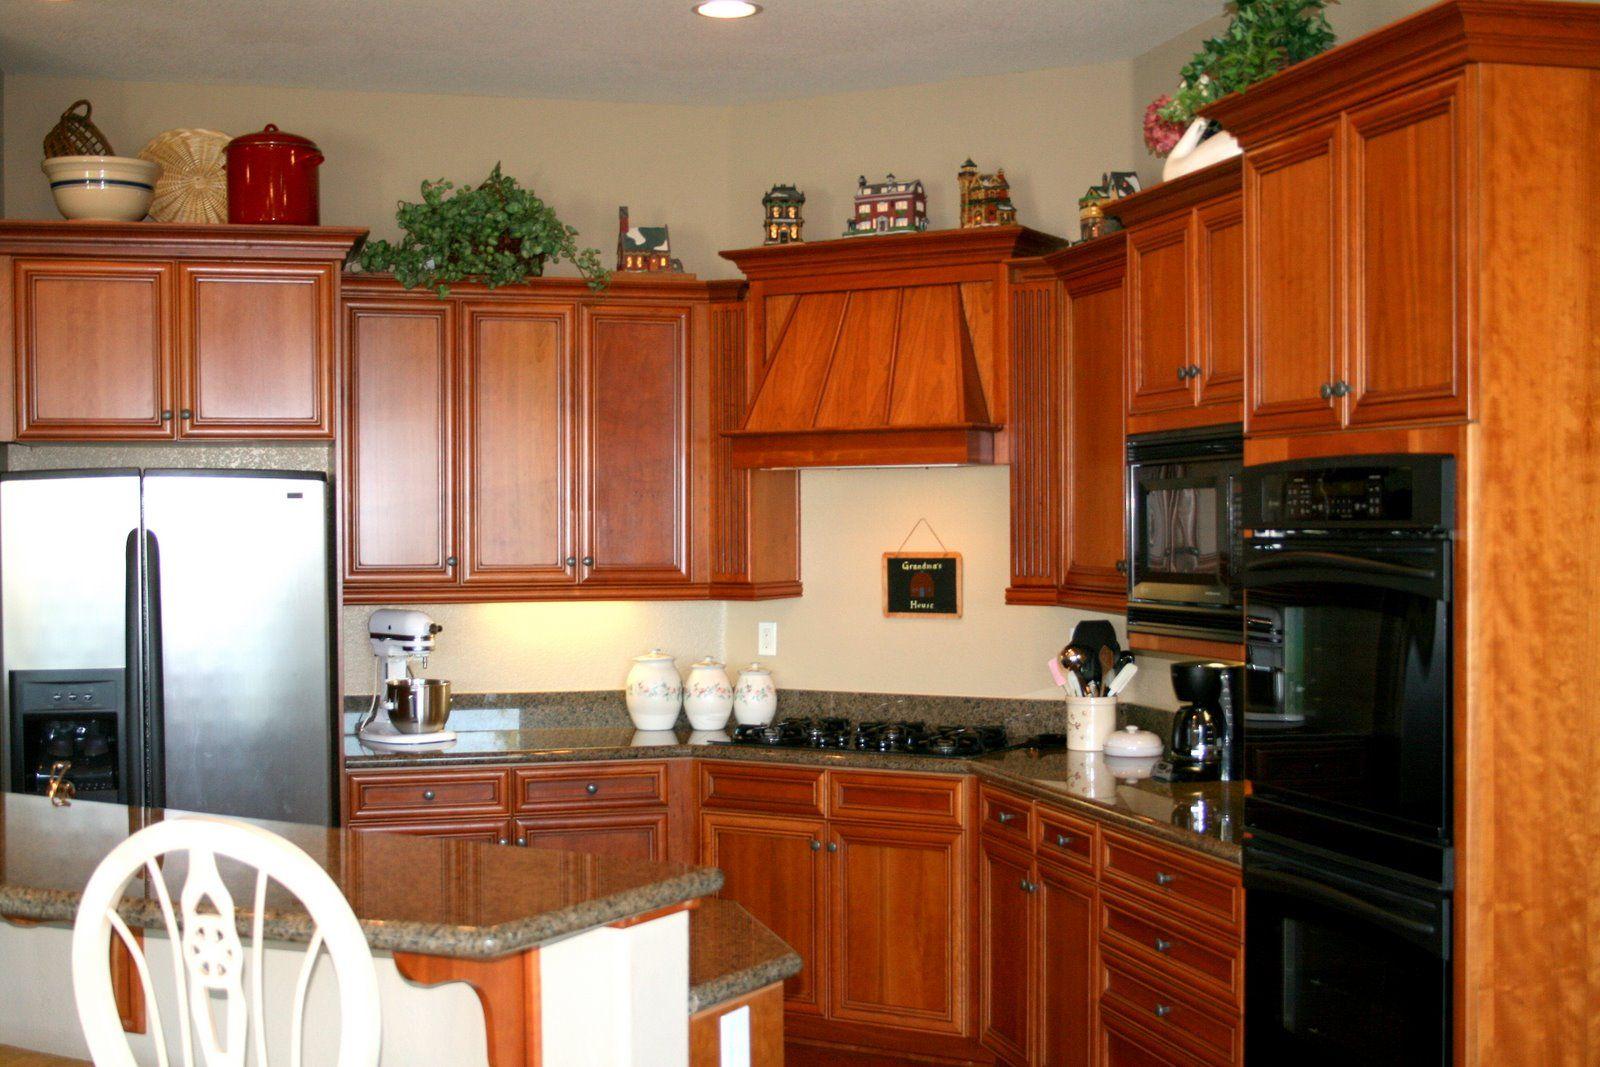 17 best images about kitchen on pinterest modern kitchen cabinets small kitchens and cabinets - Kitchen Island Plans